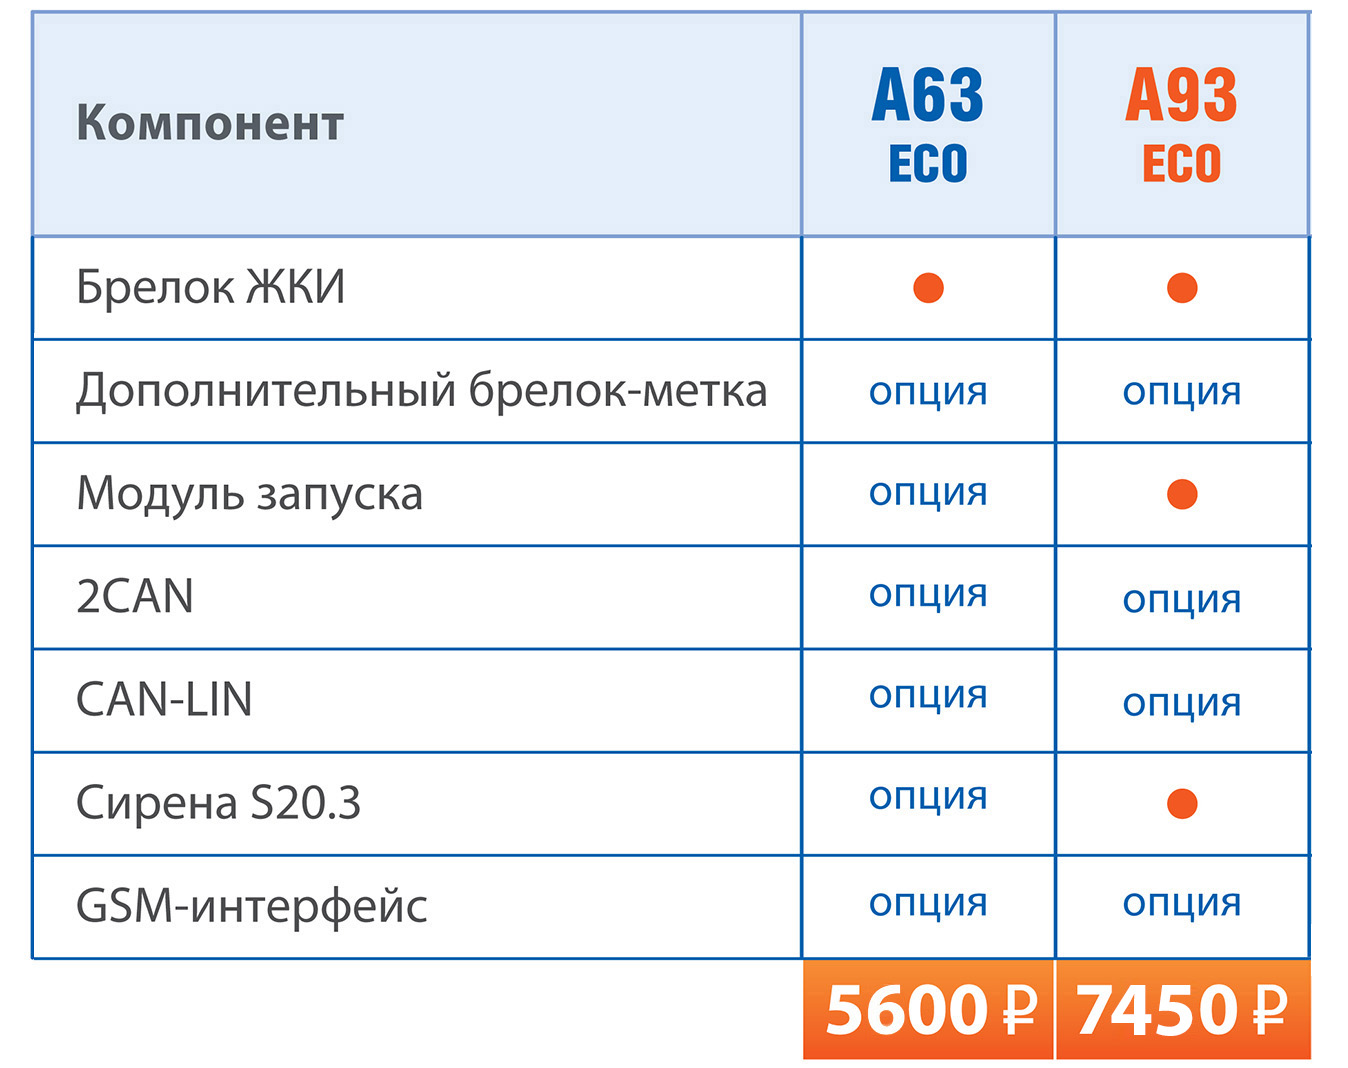 Комплектация автосигнализации StarLine A63 и A93 eco